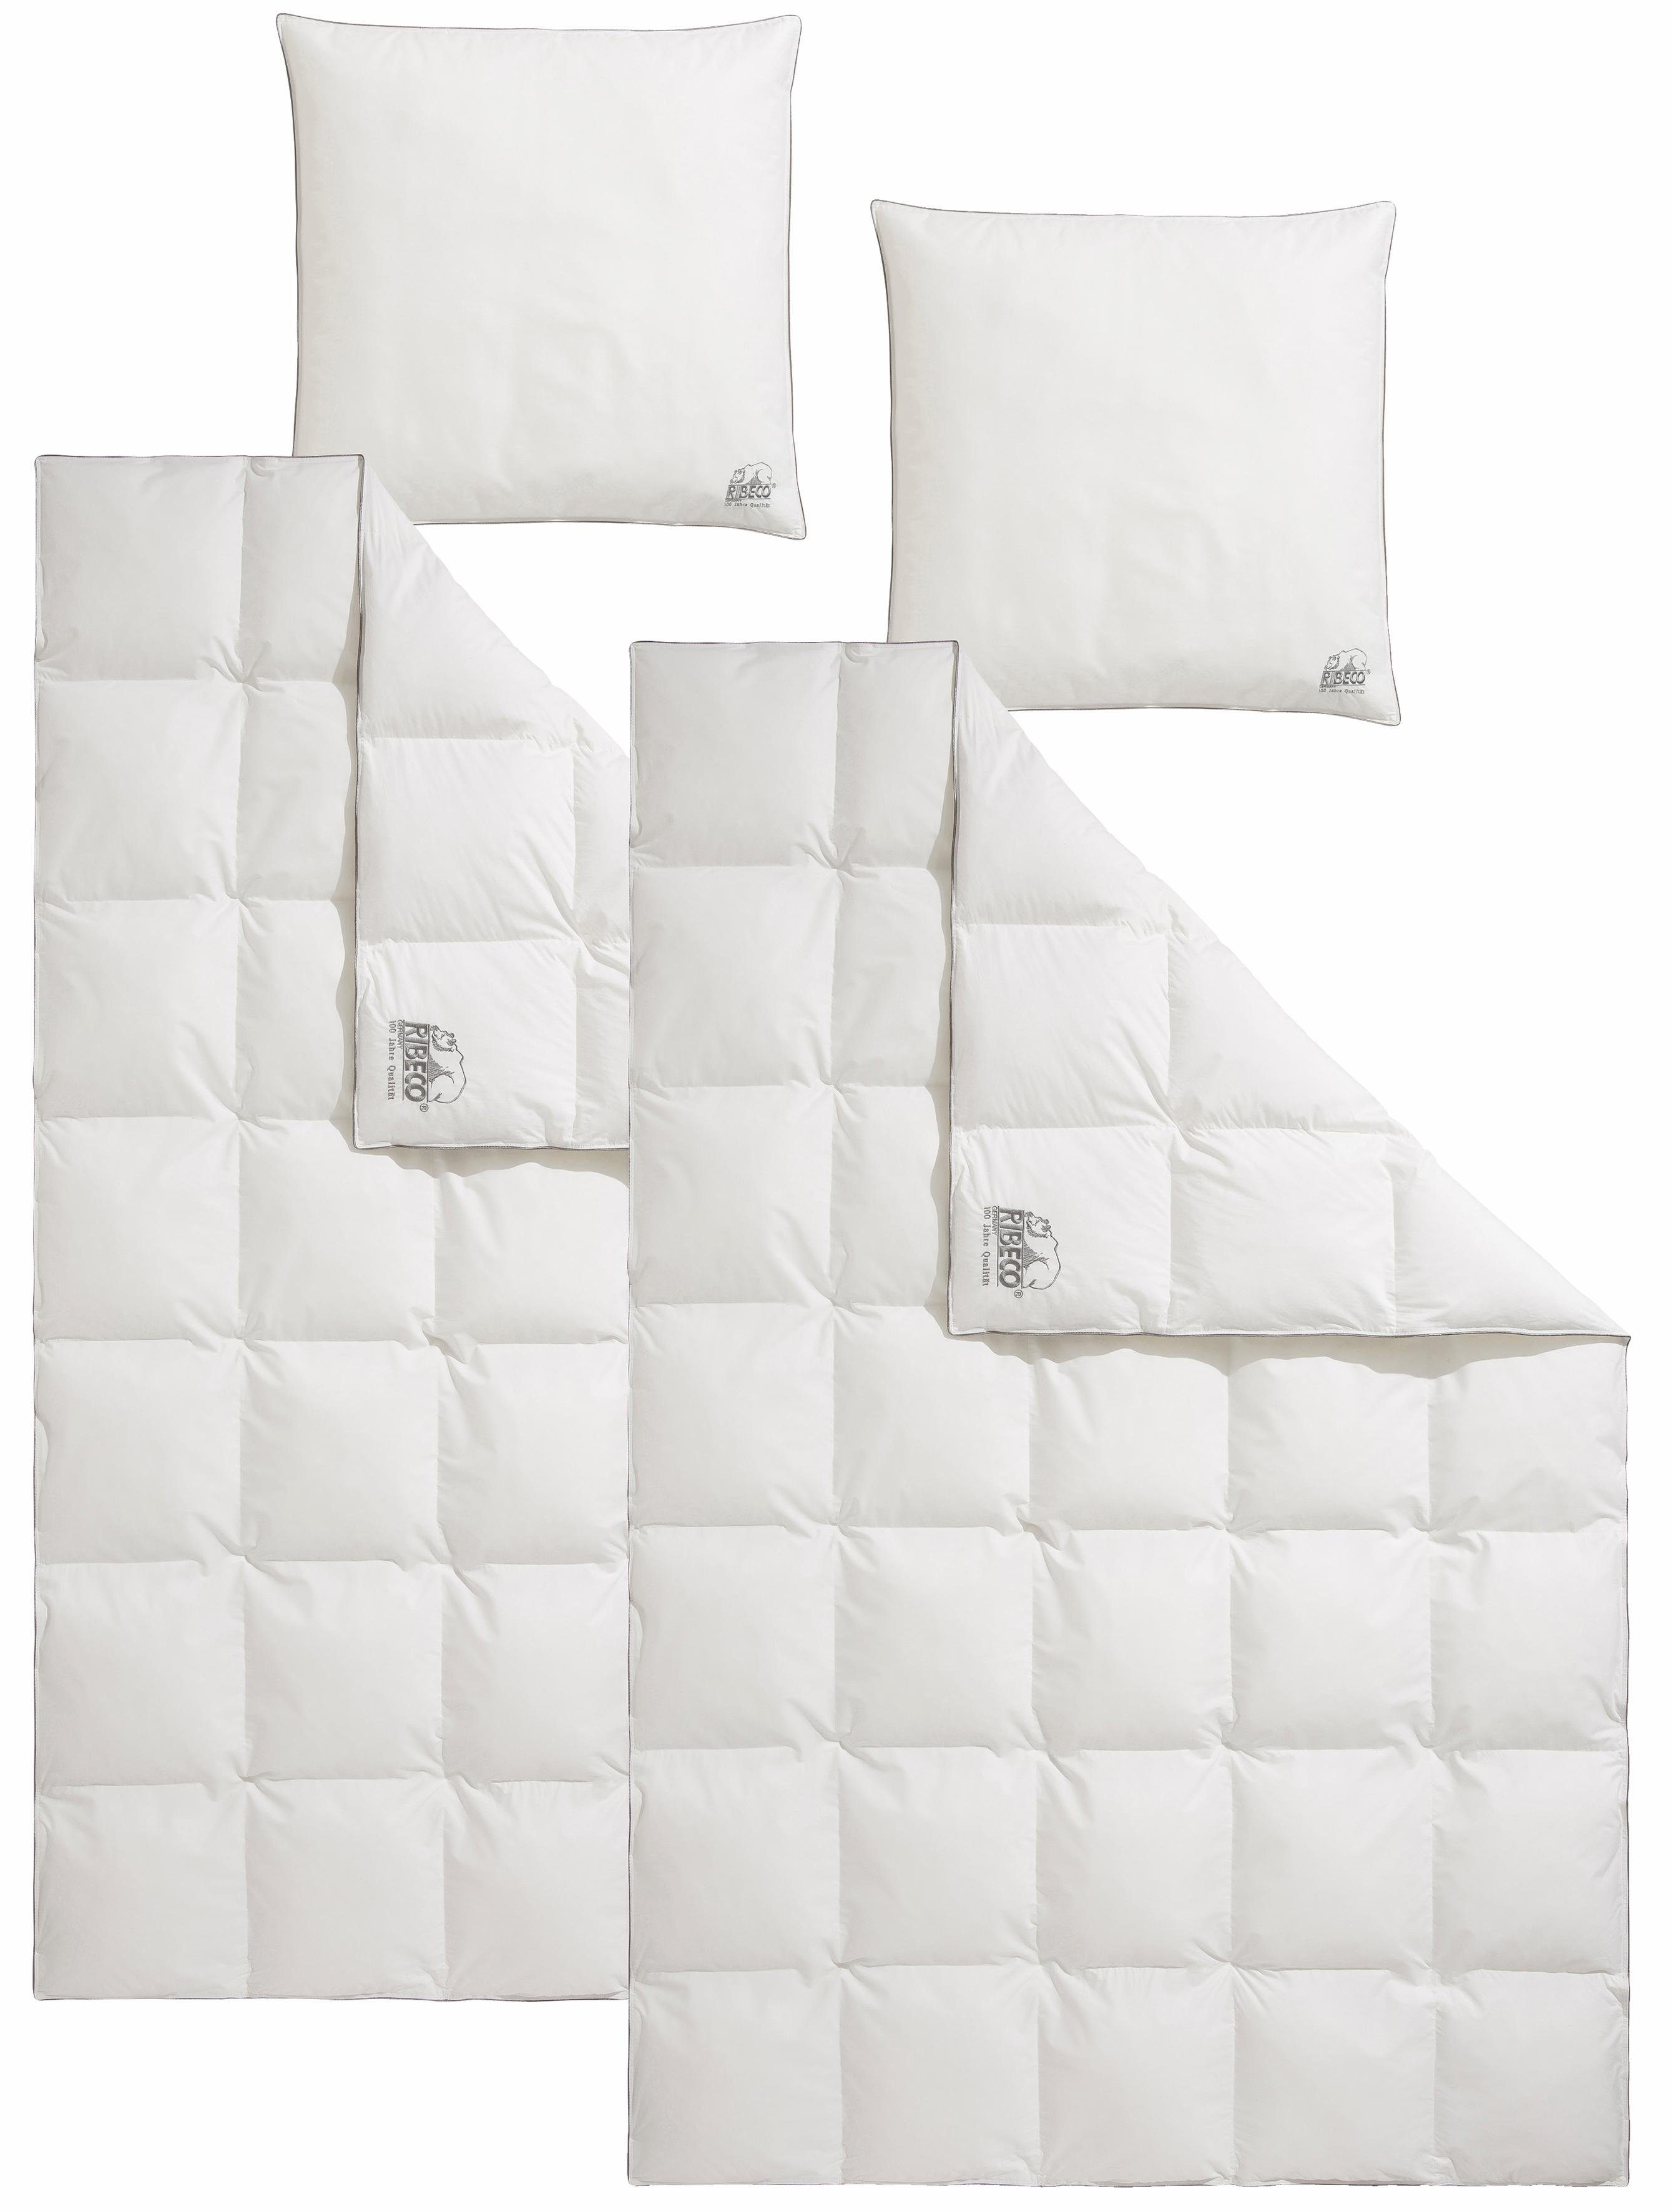 Bettdecken Masse Schweiz Schlafzimmer Grundriss Bettwsche Handtcher Waschen Bettdecken Test